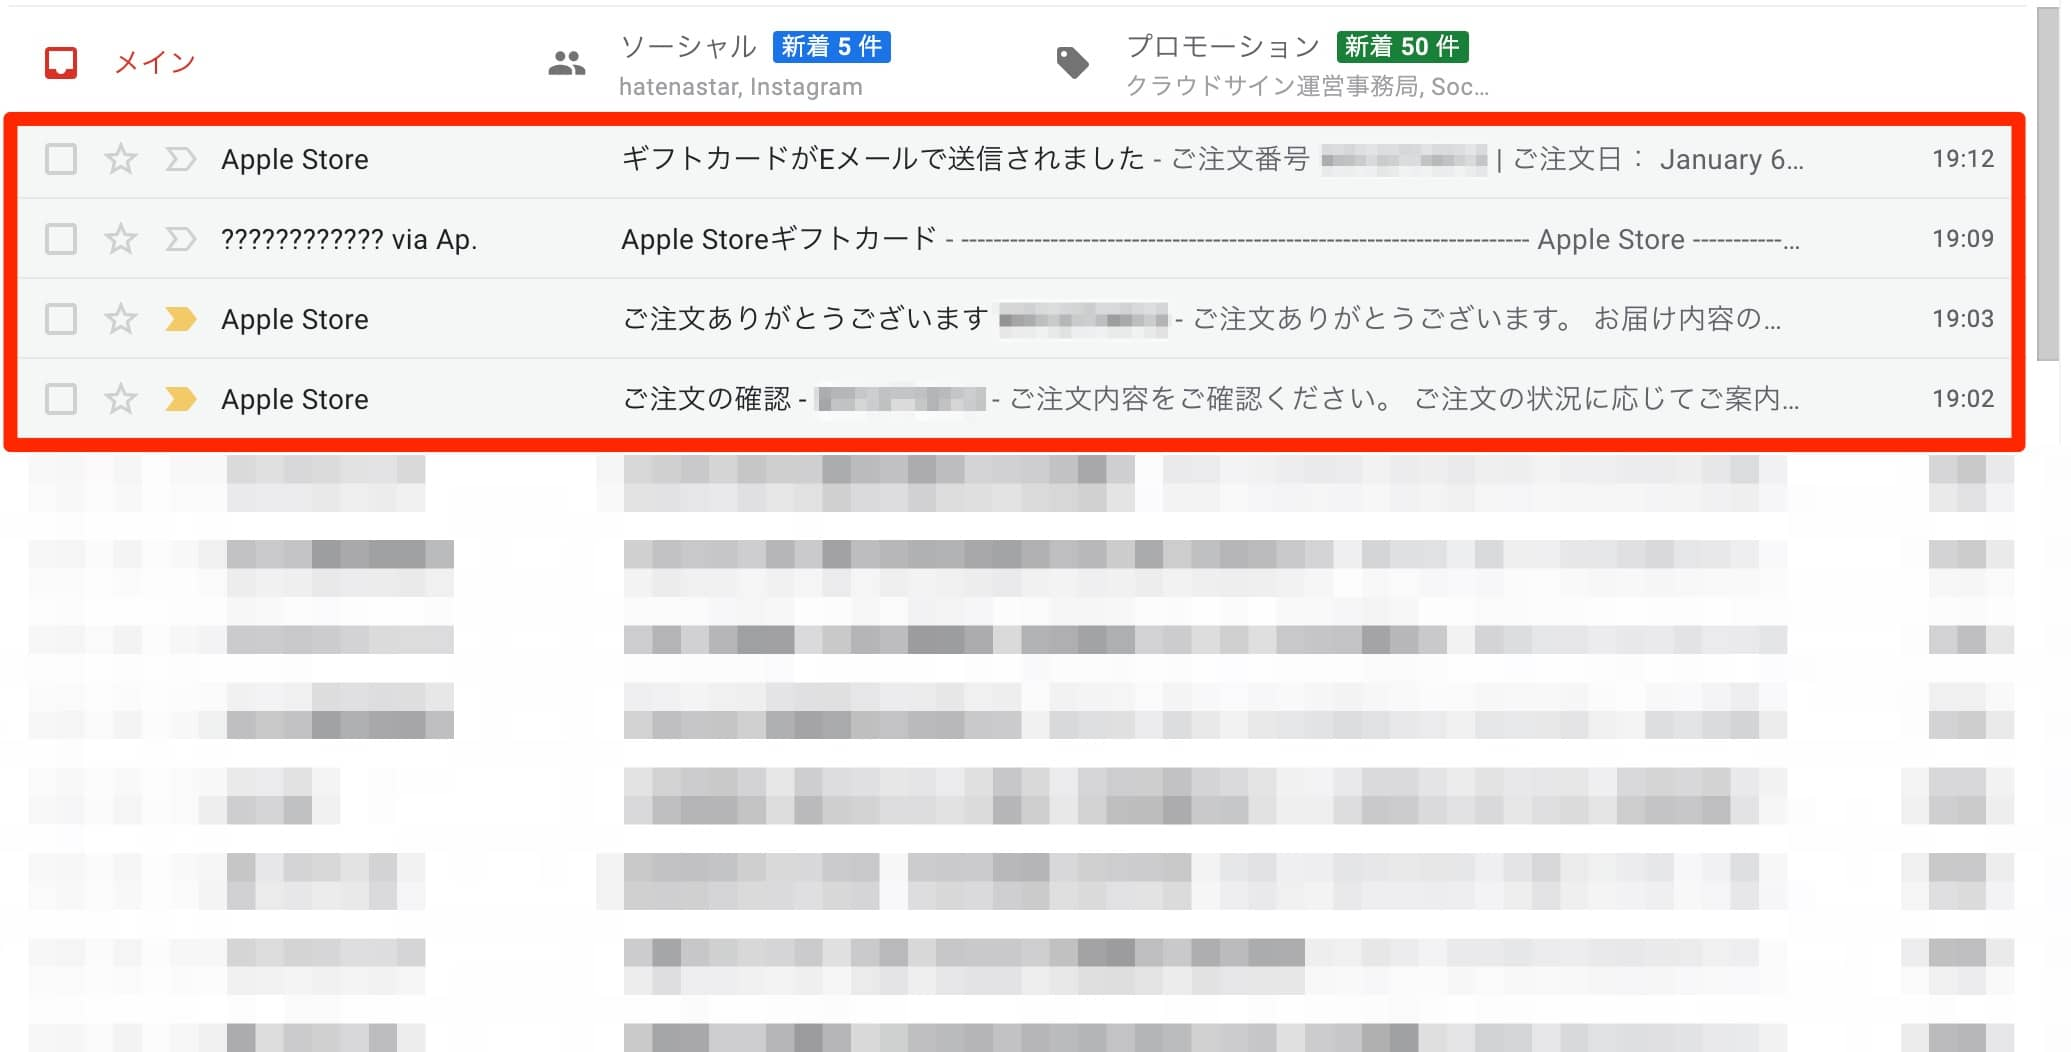 appleギフトカード購入完了のメール